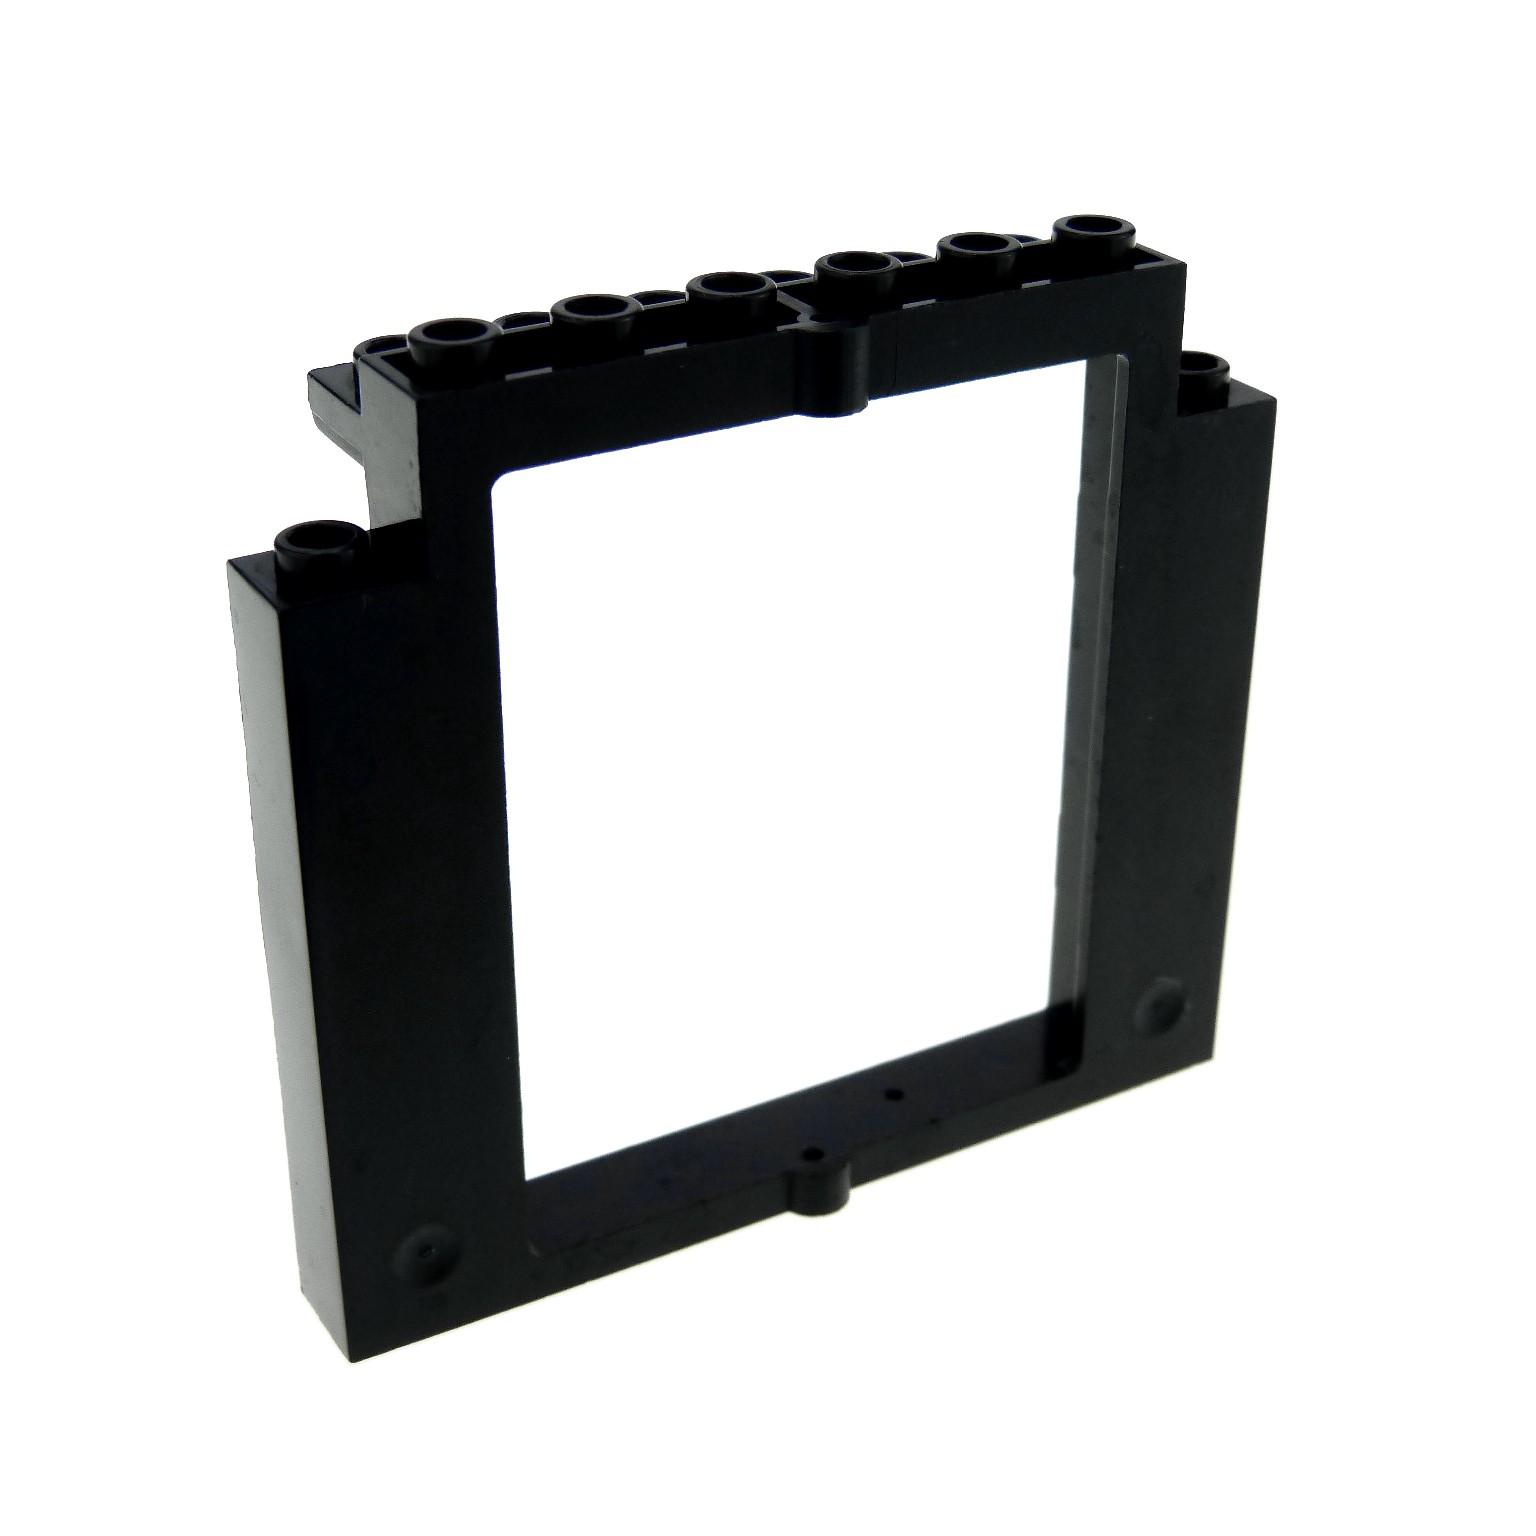 1 x Lego System Tür Rahmen schwarz 2x8x6 Castle Drehtür Burg Fenster ...